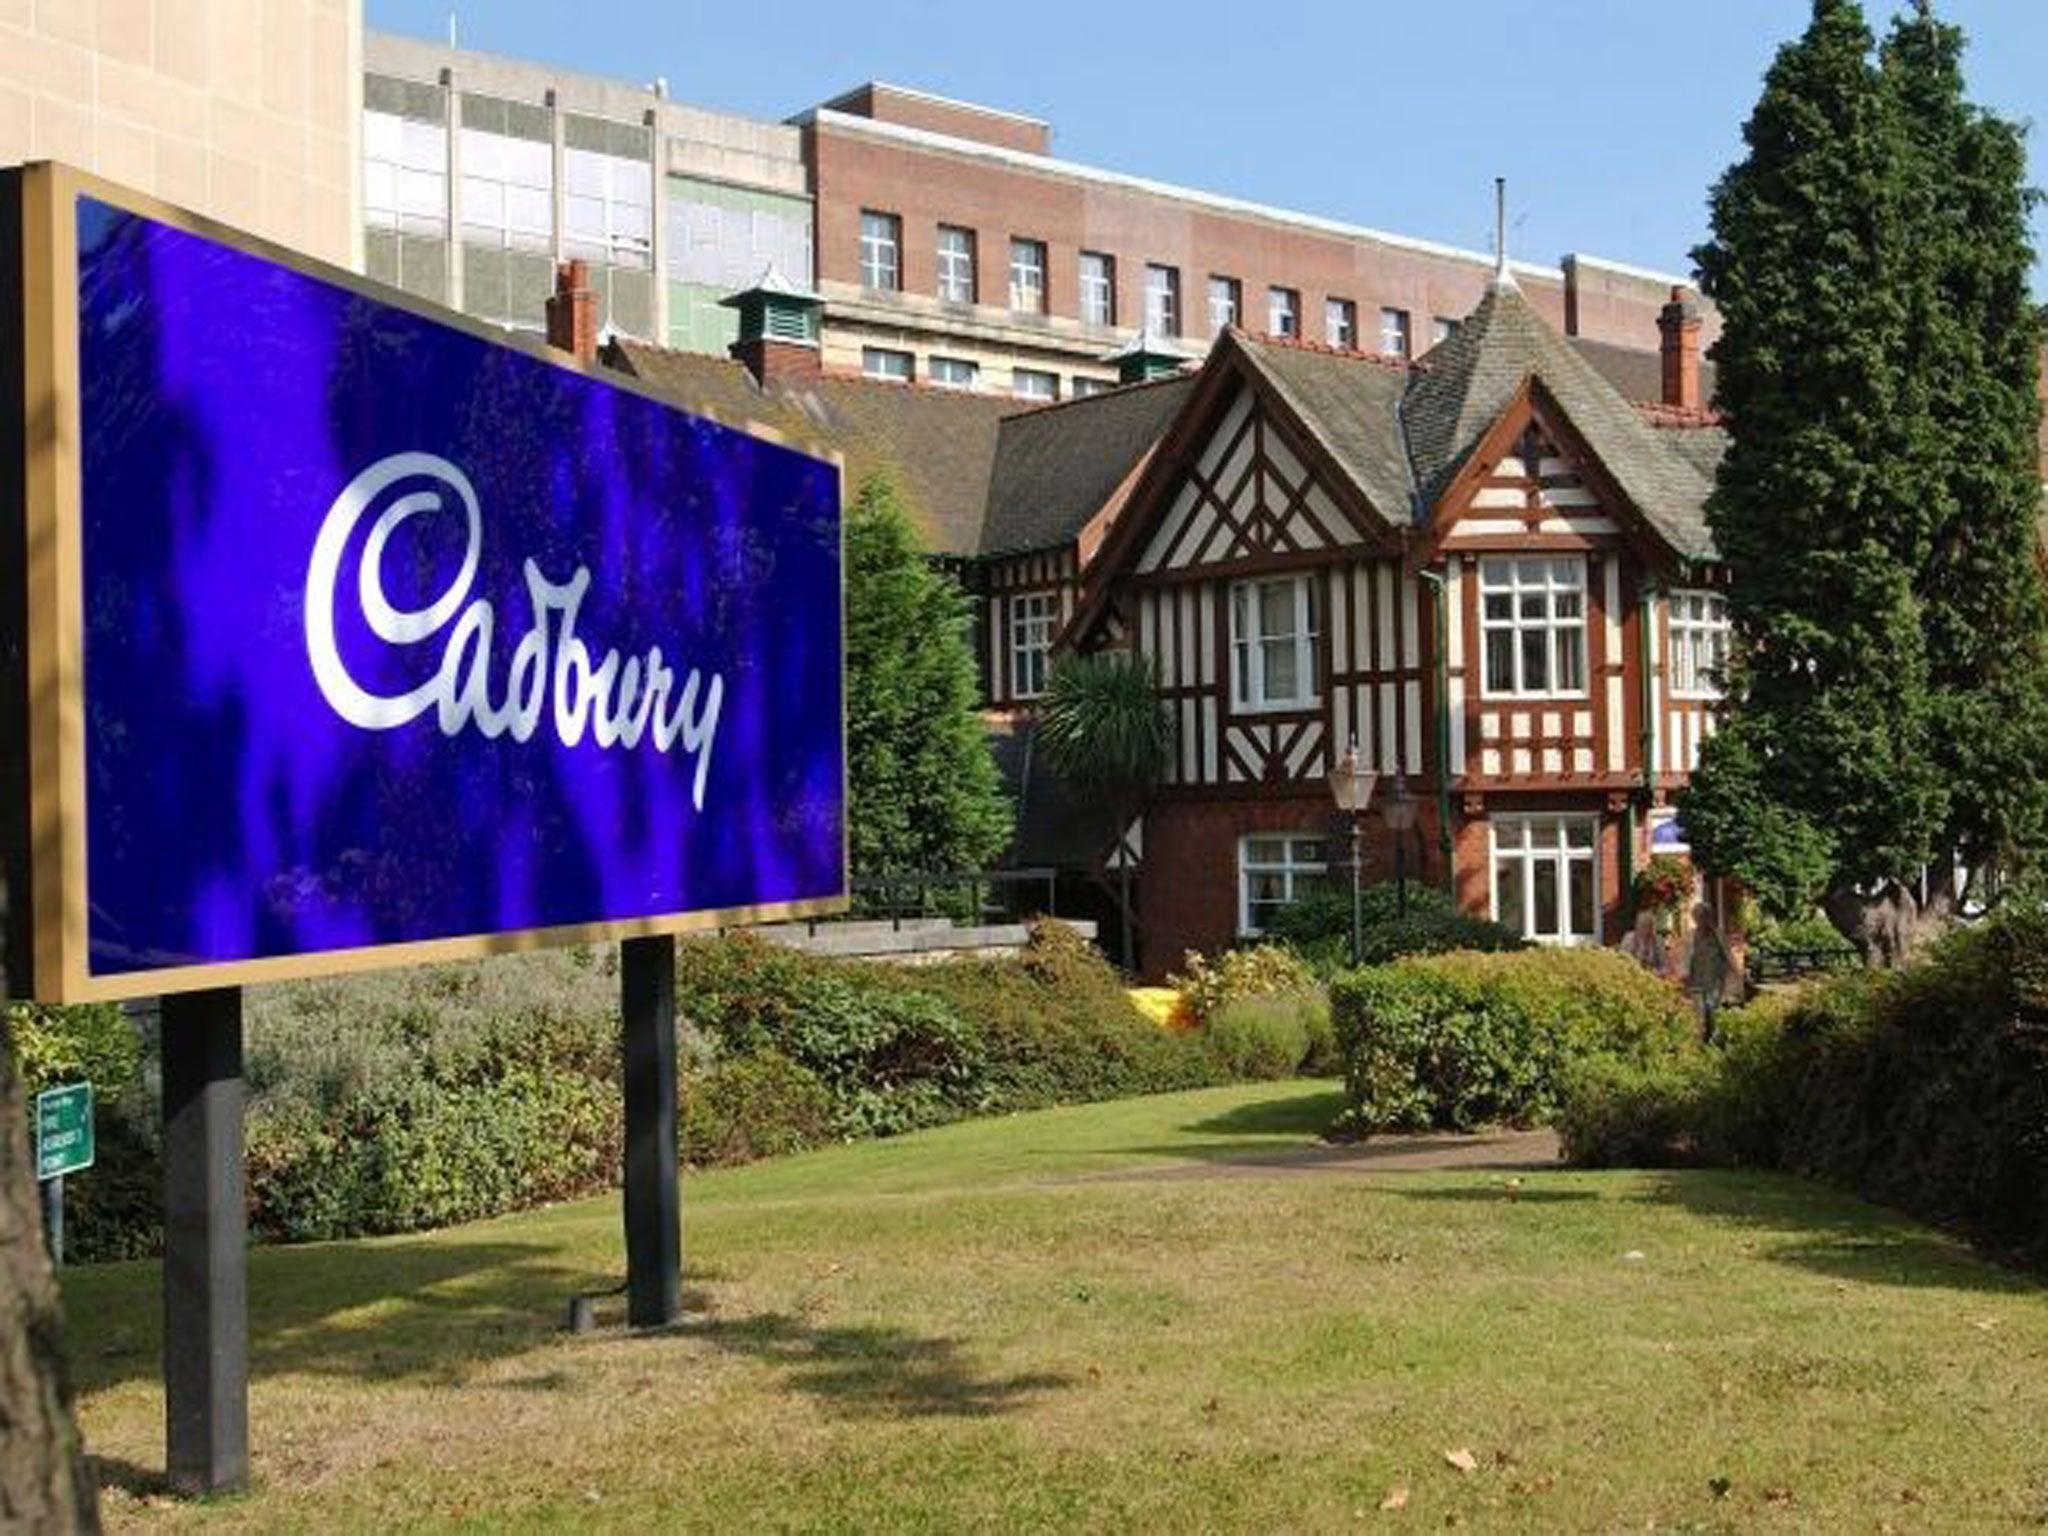 Cadbury Owner Mondelez International To Cut Over 200 Jobs